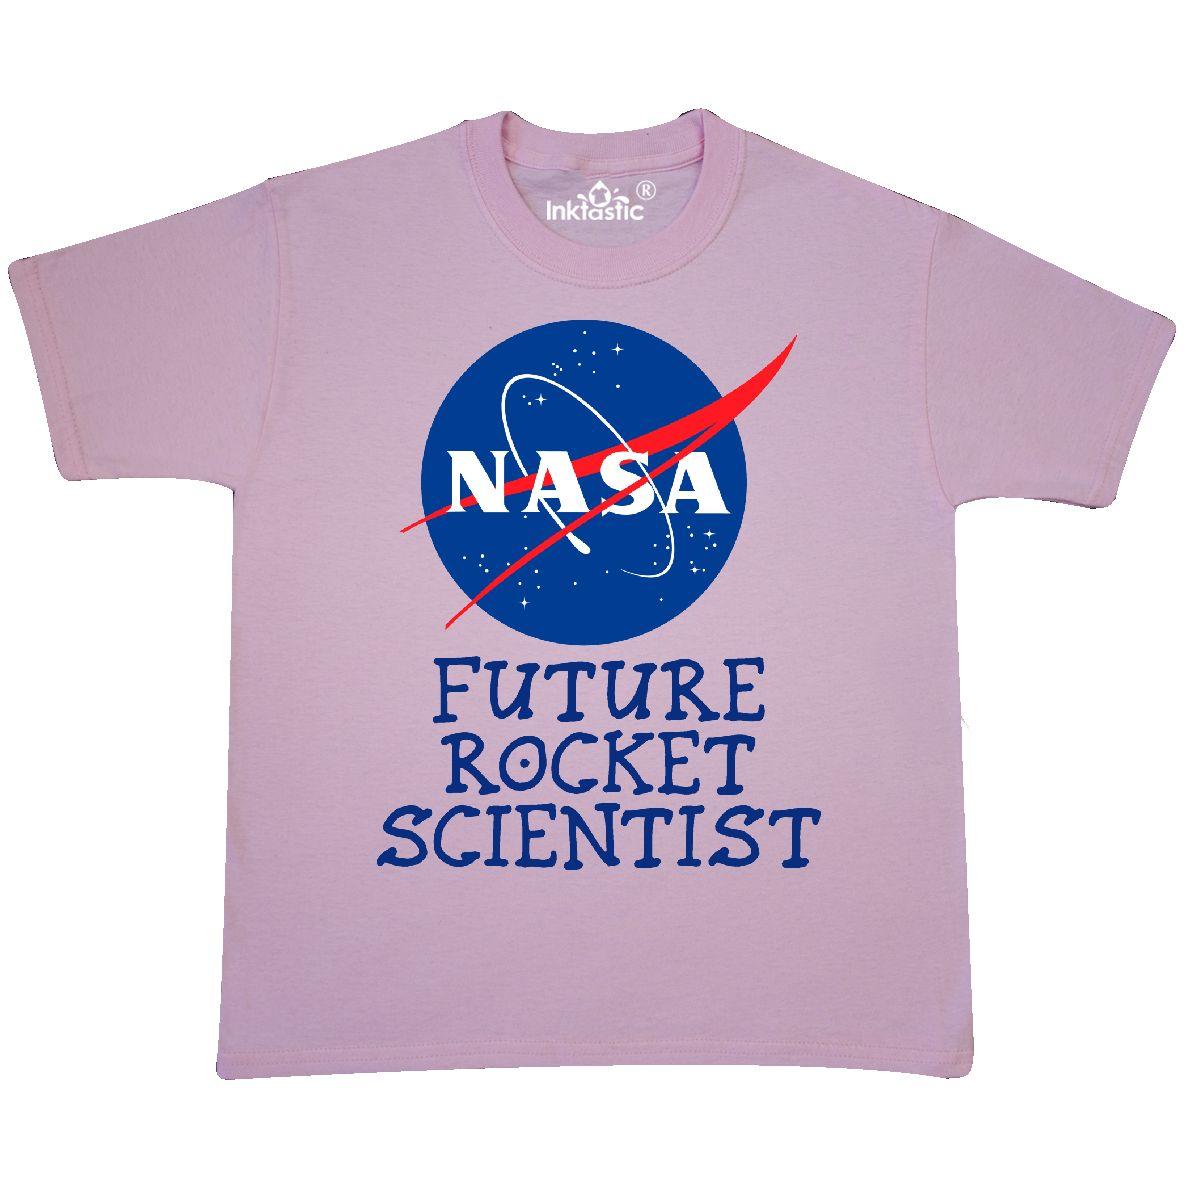 Inktastic Nasa Future Rocket Scientist Youth T Shirt Baby Shower